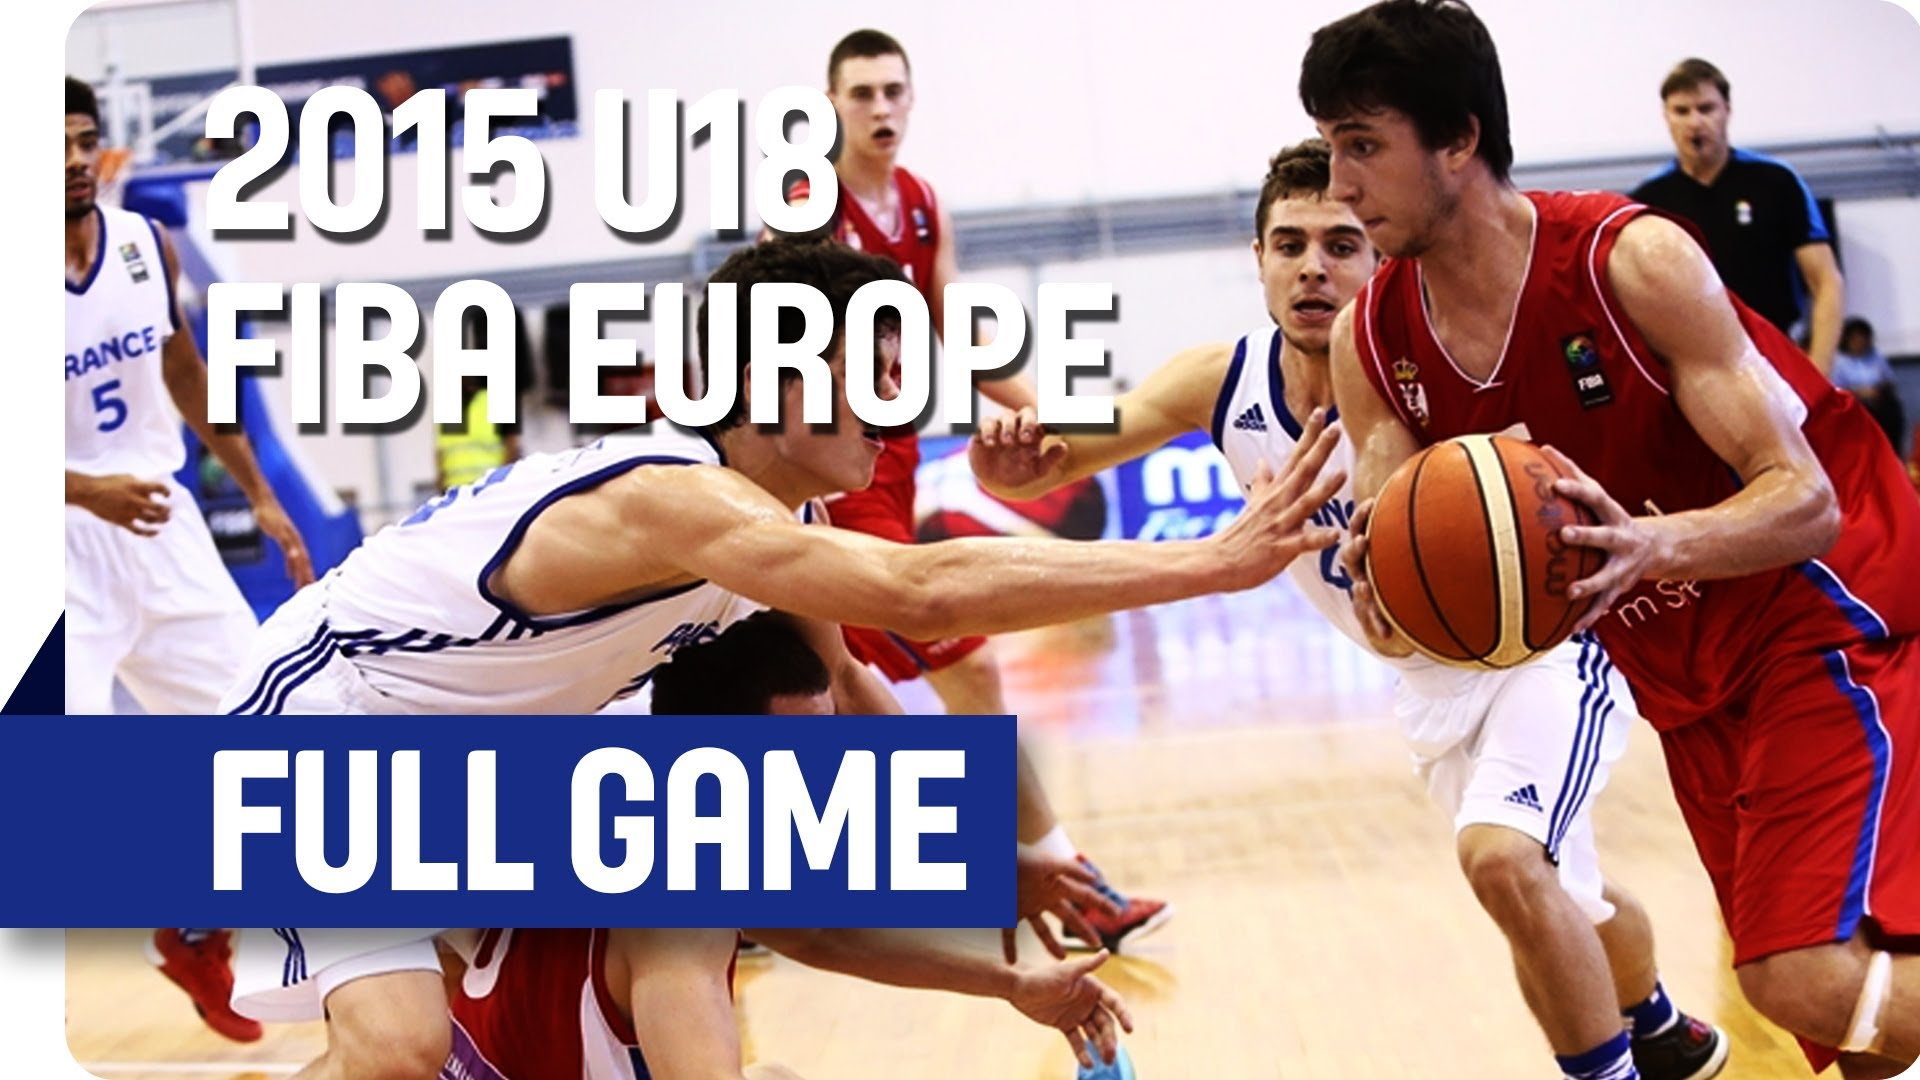 France v Serbia - Game for 5th - Live Stream - 2015 U18 European Championship Men